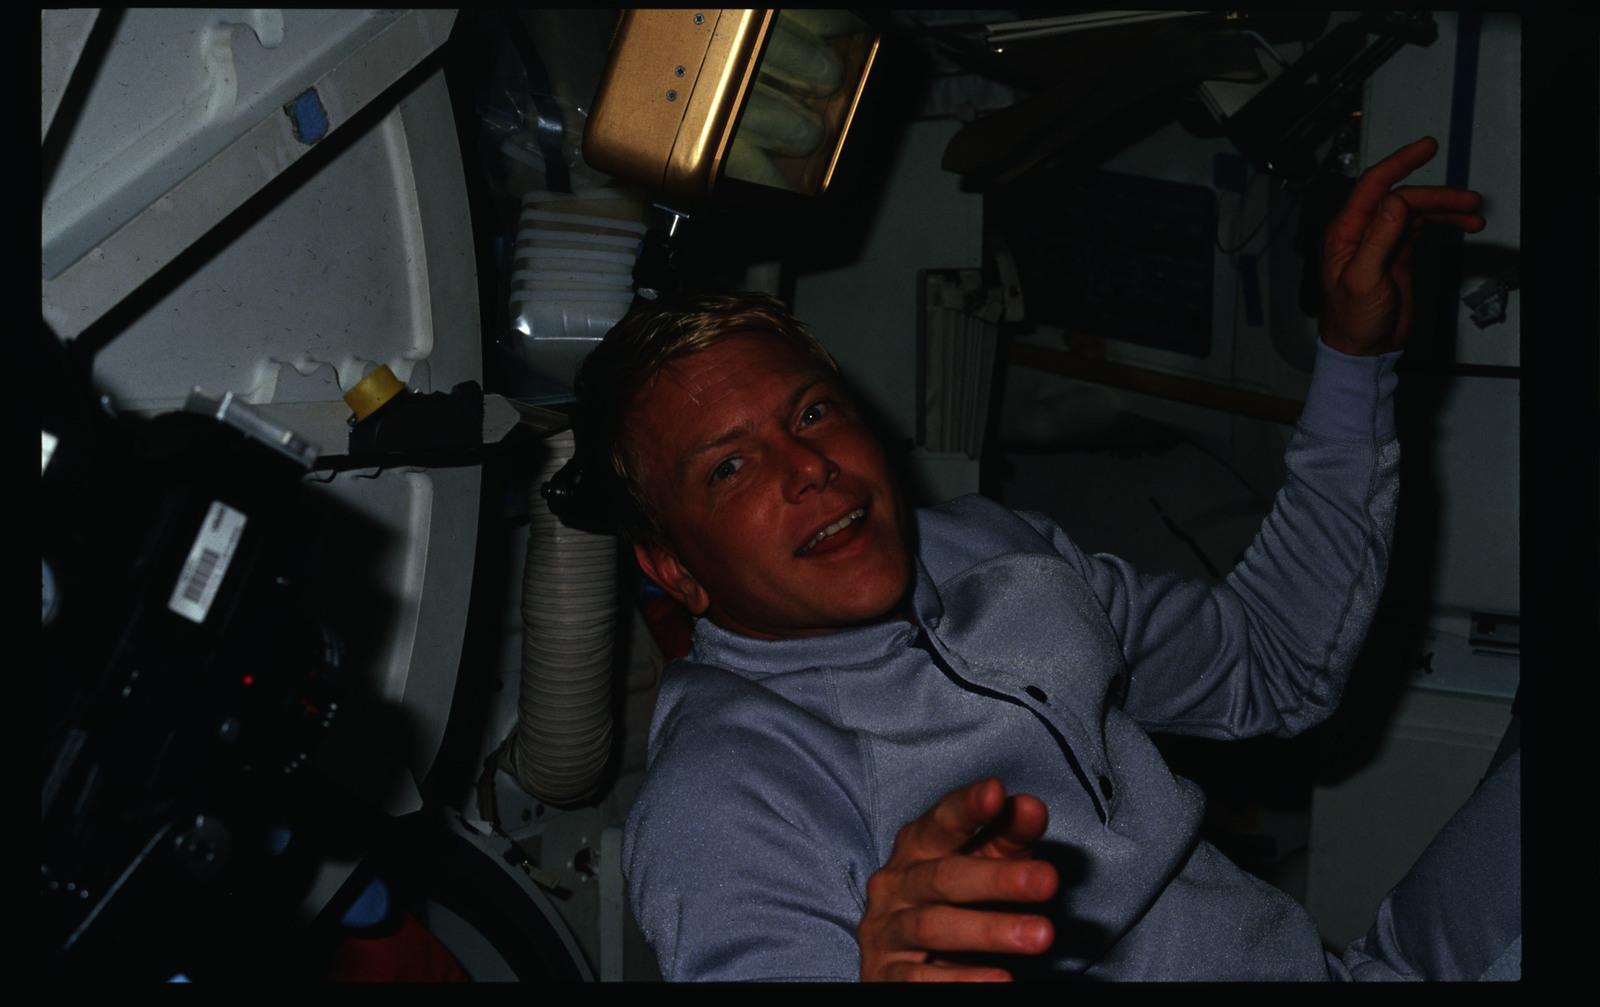 S26-05-017 - STS-026 - STS-26 crew activities